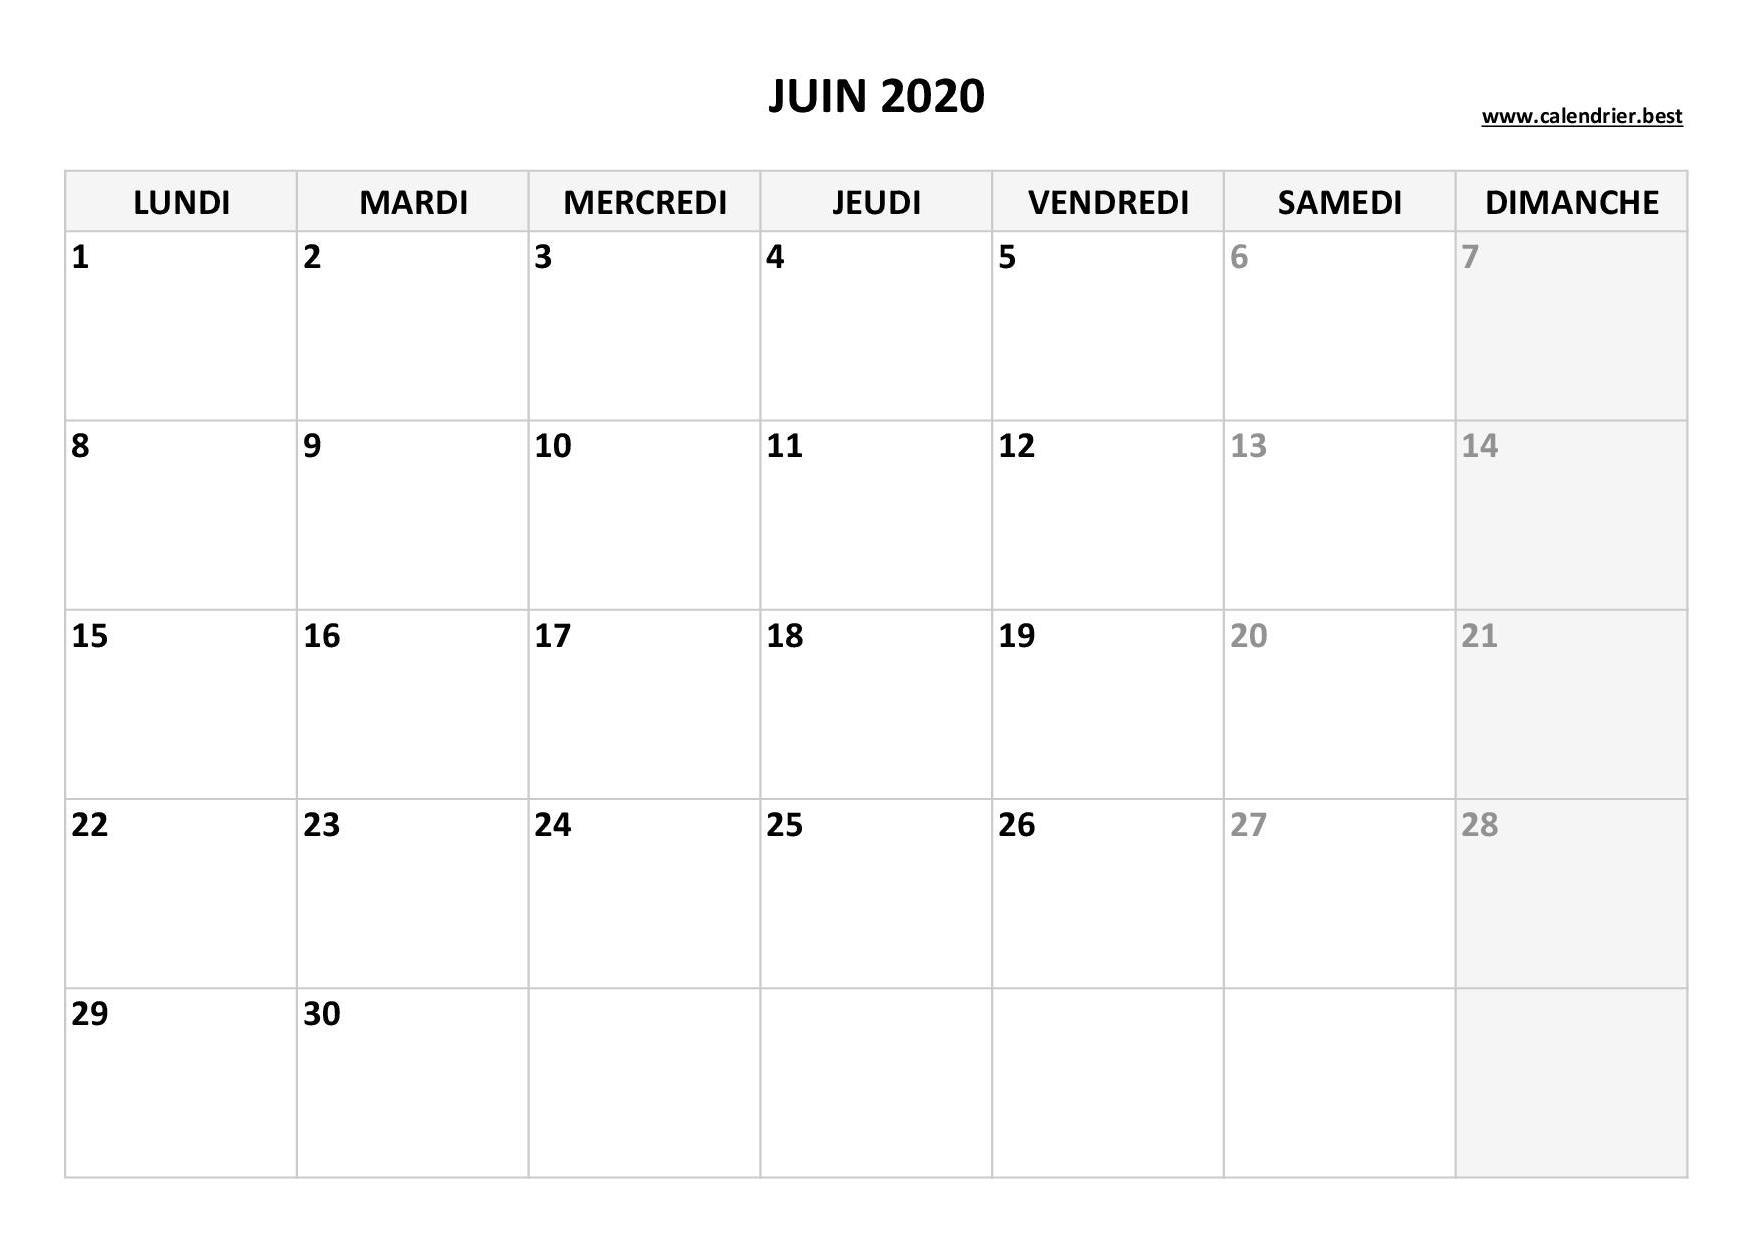 Calendrier Juin 2020 A Consulter Ou Imprimer Calendrier Best